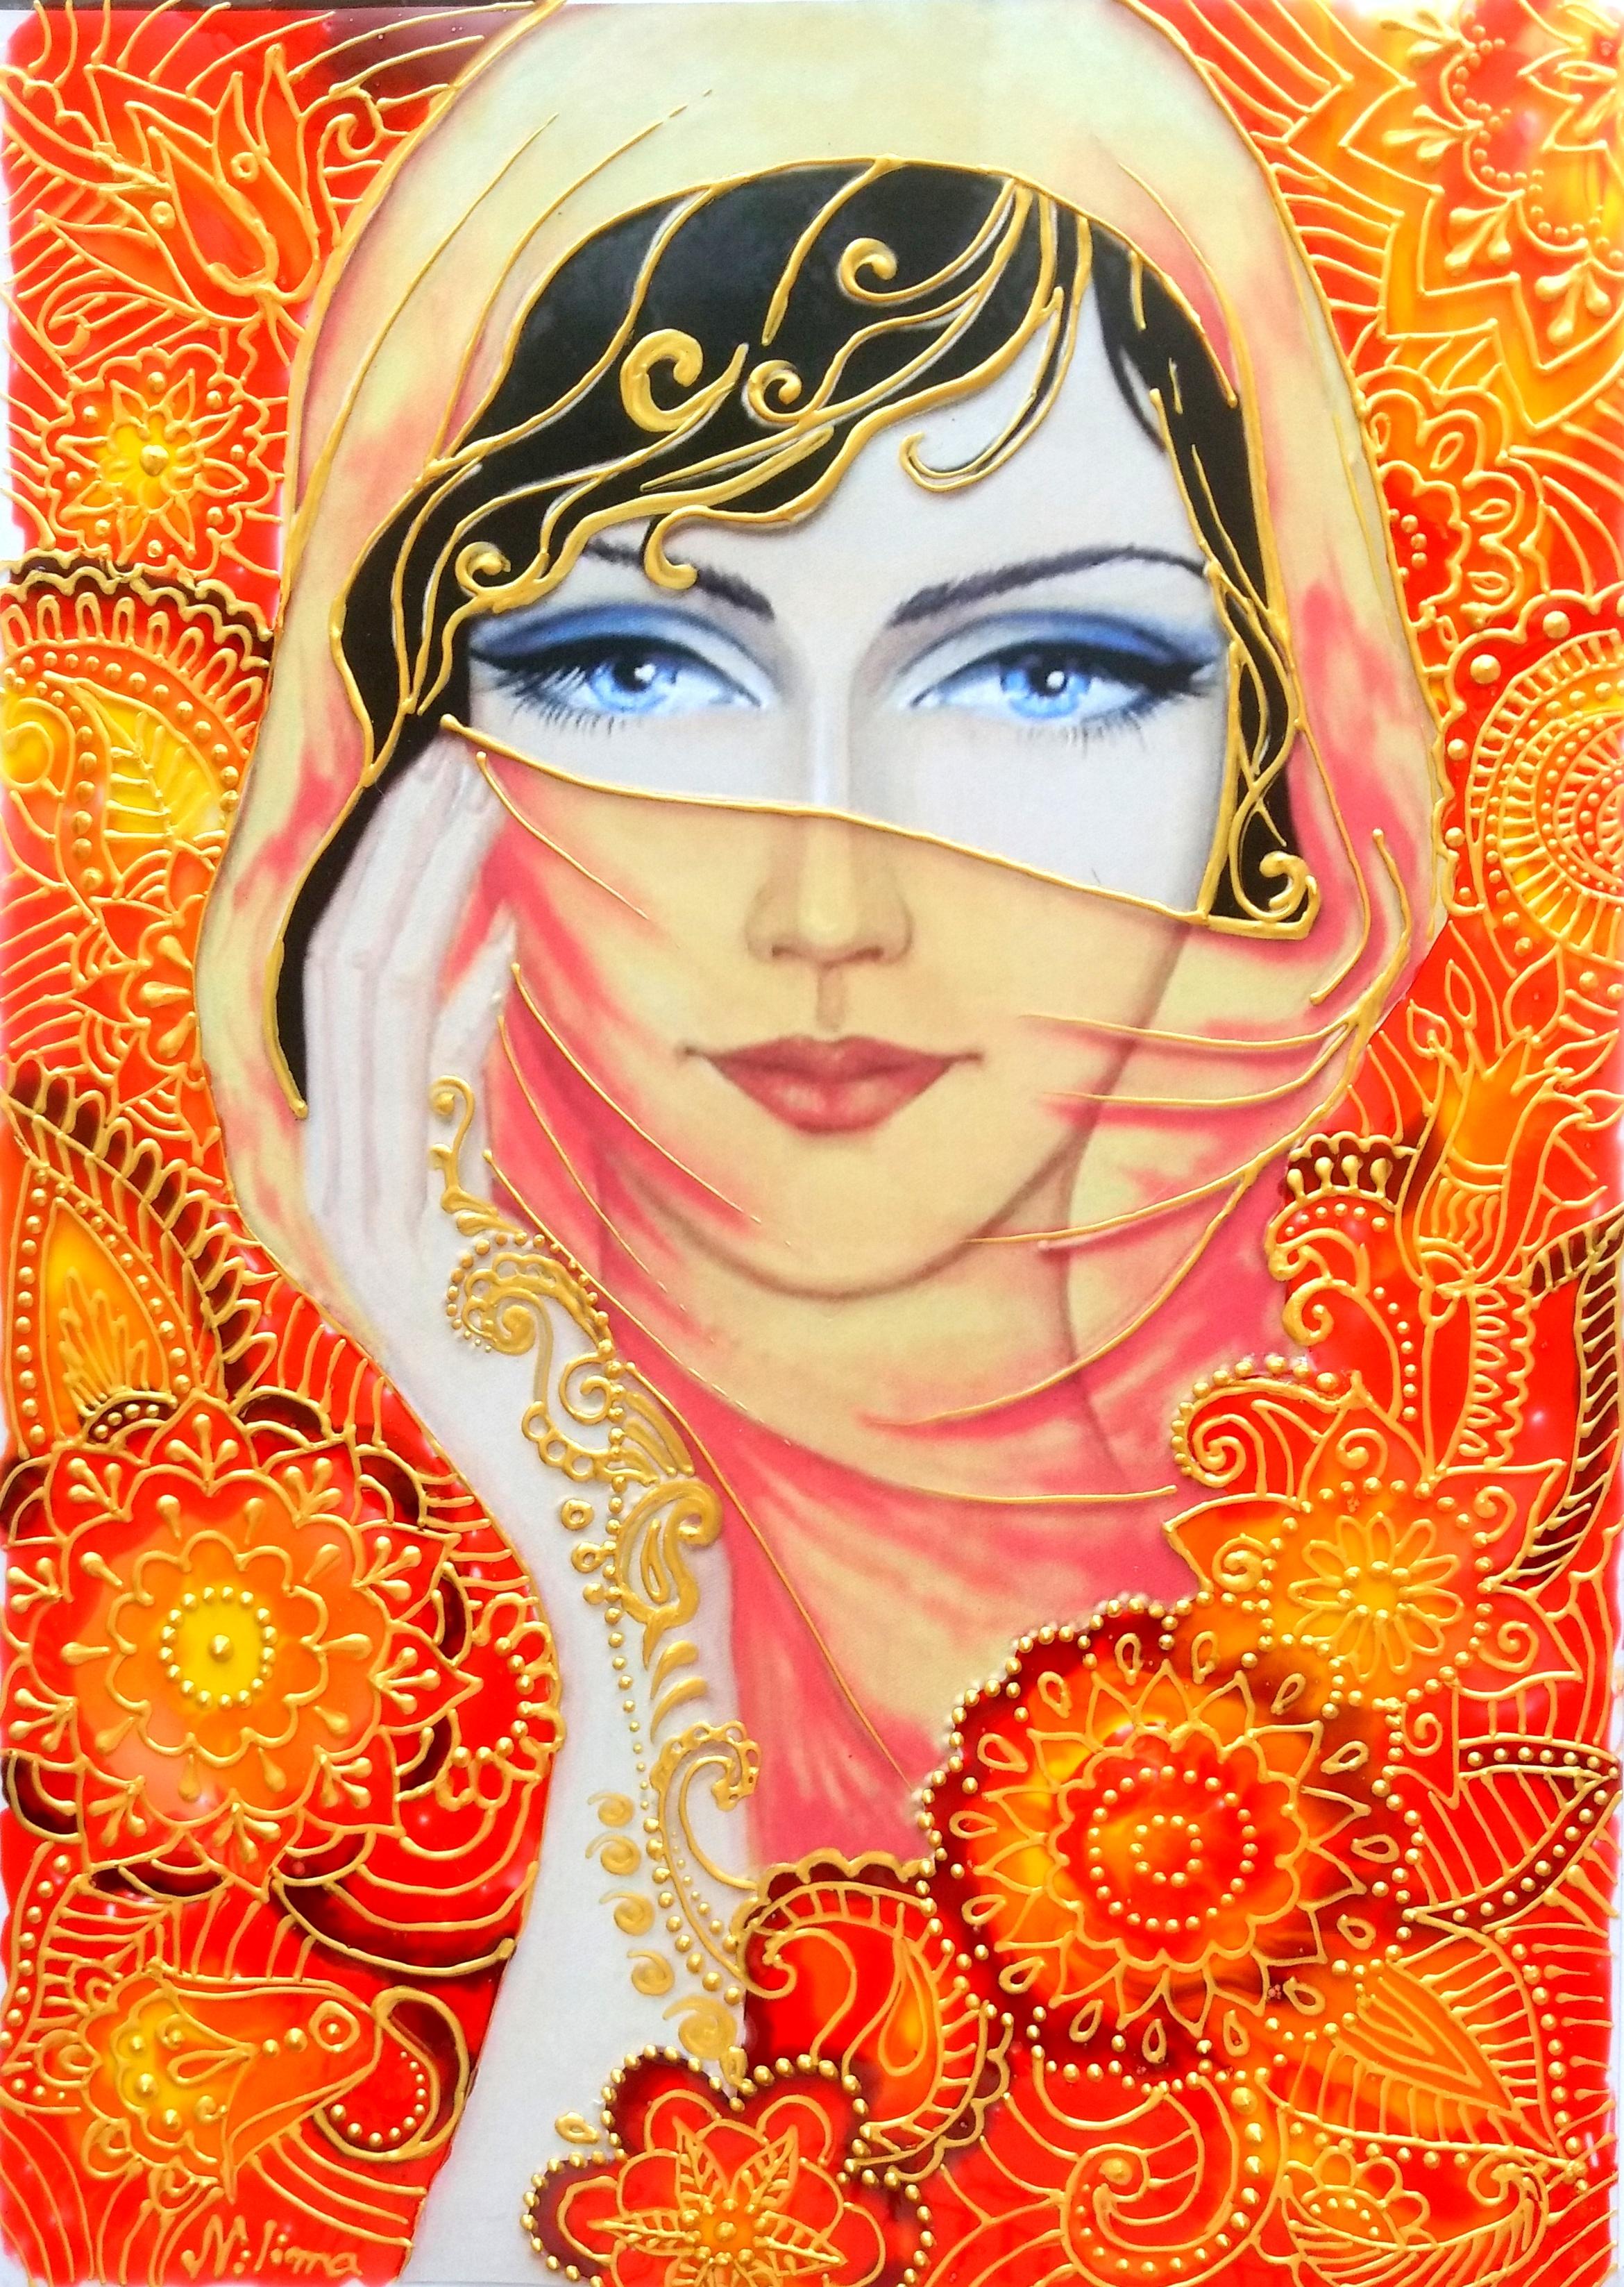 GLASS PAINTING OF BEAUTIFUL LADY WEARING SCARF - CREATIVE ART